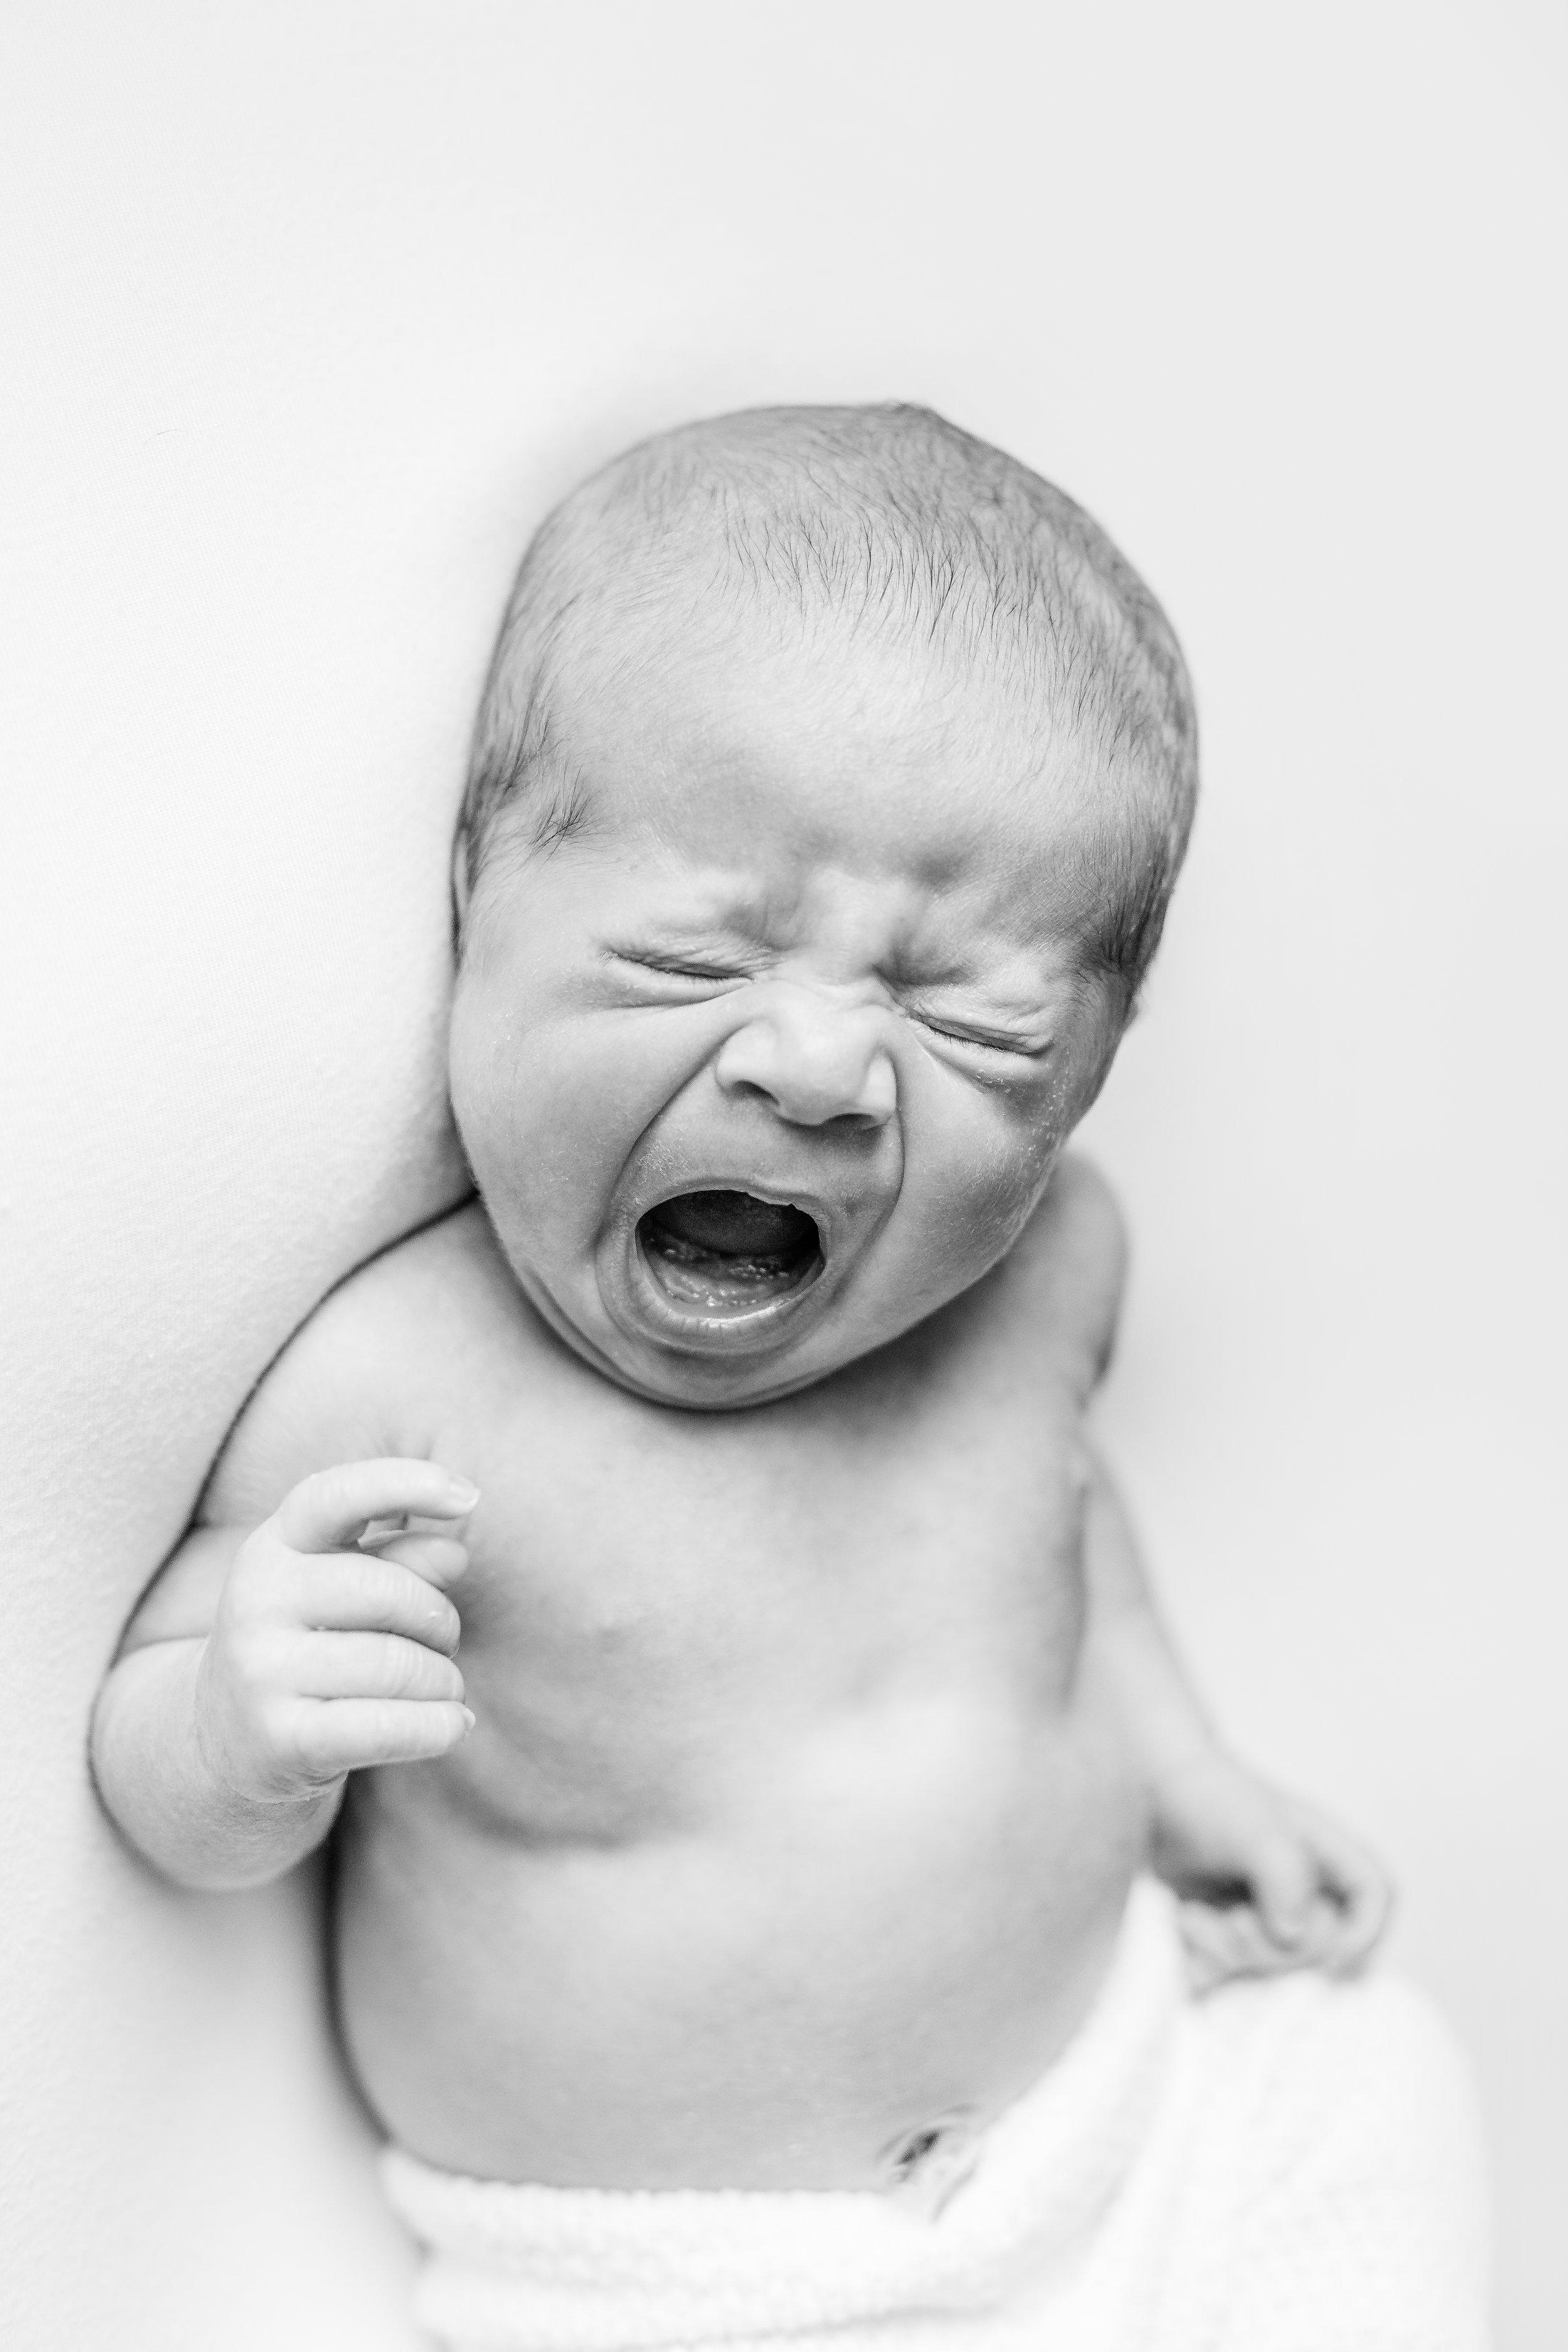 Top Newborn Photographer in Central Ohio